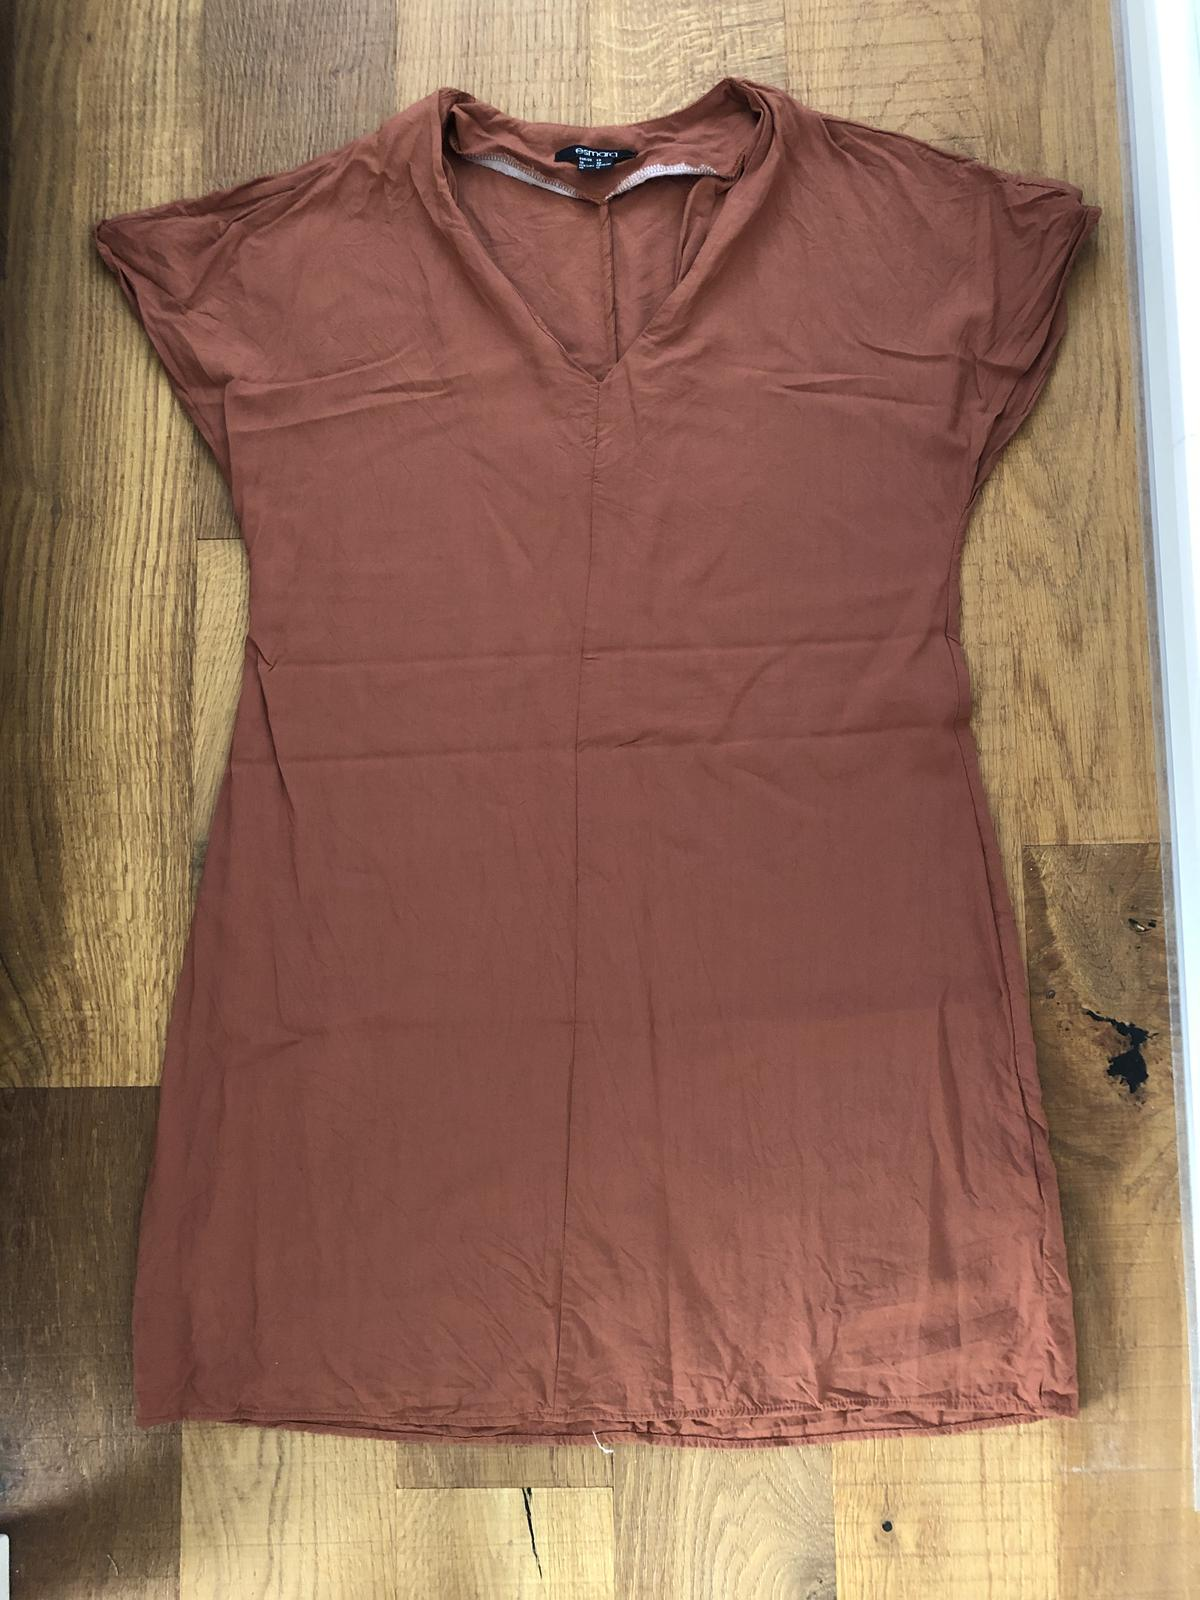 Esmara koňakové šaty 38 - Obrázek č. 1